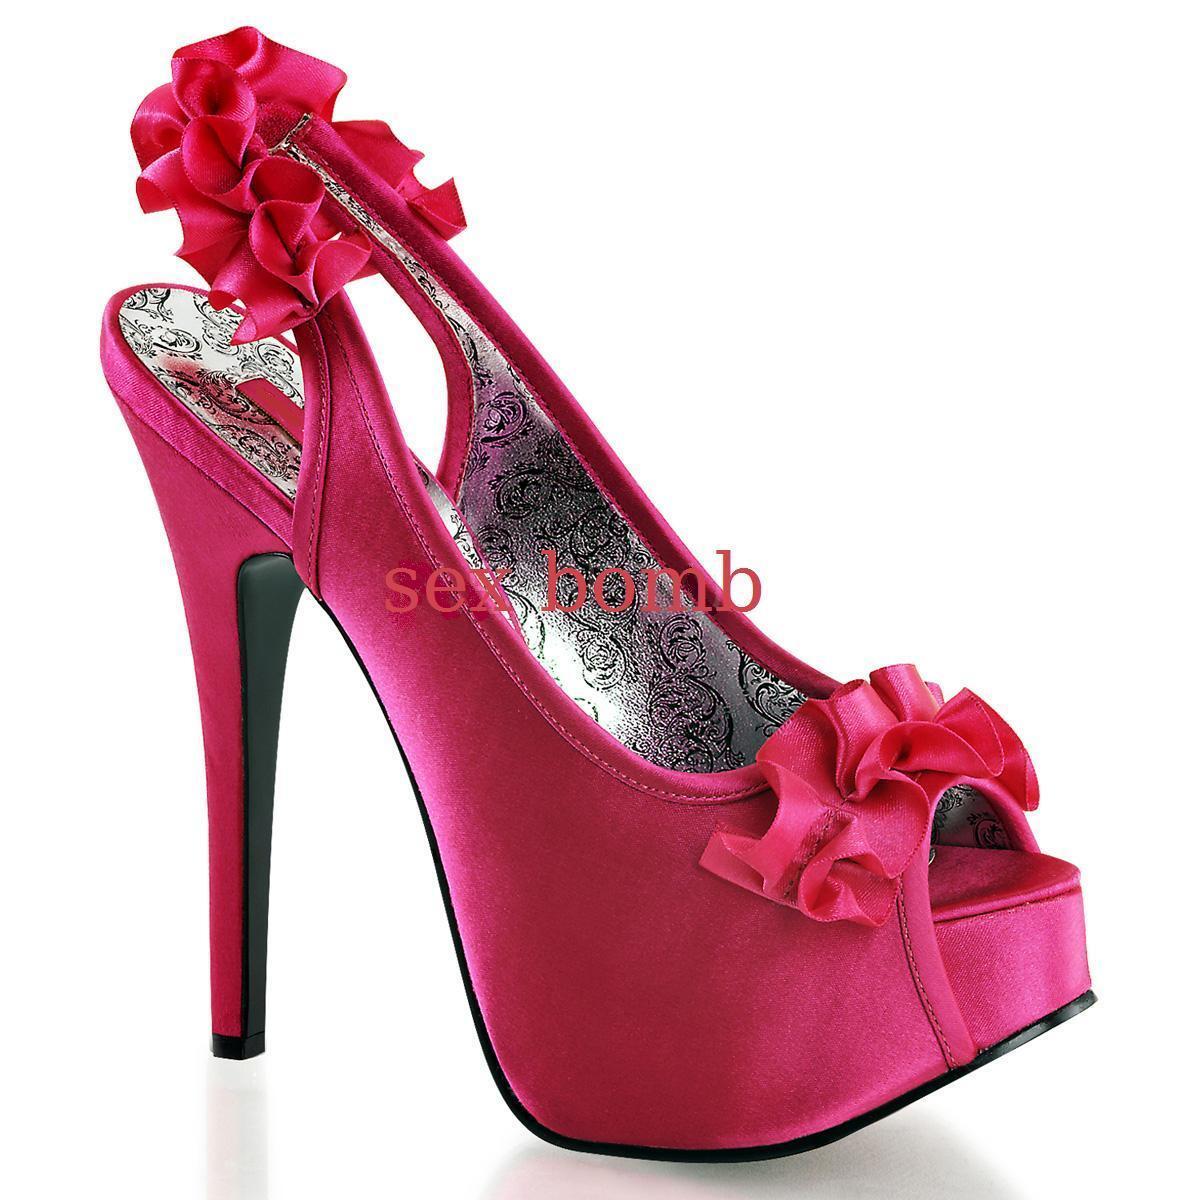 SEXY shoes decolte SPUNTATE plateau invisibile tacco 14,5 dal 36 al 42 FUCHSIA